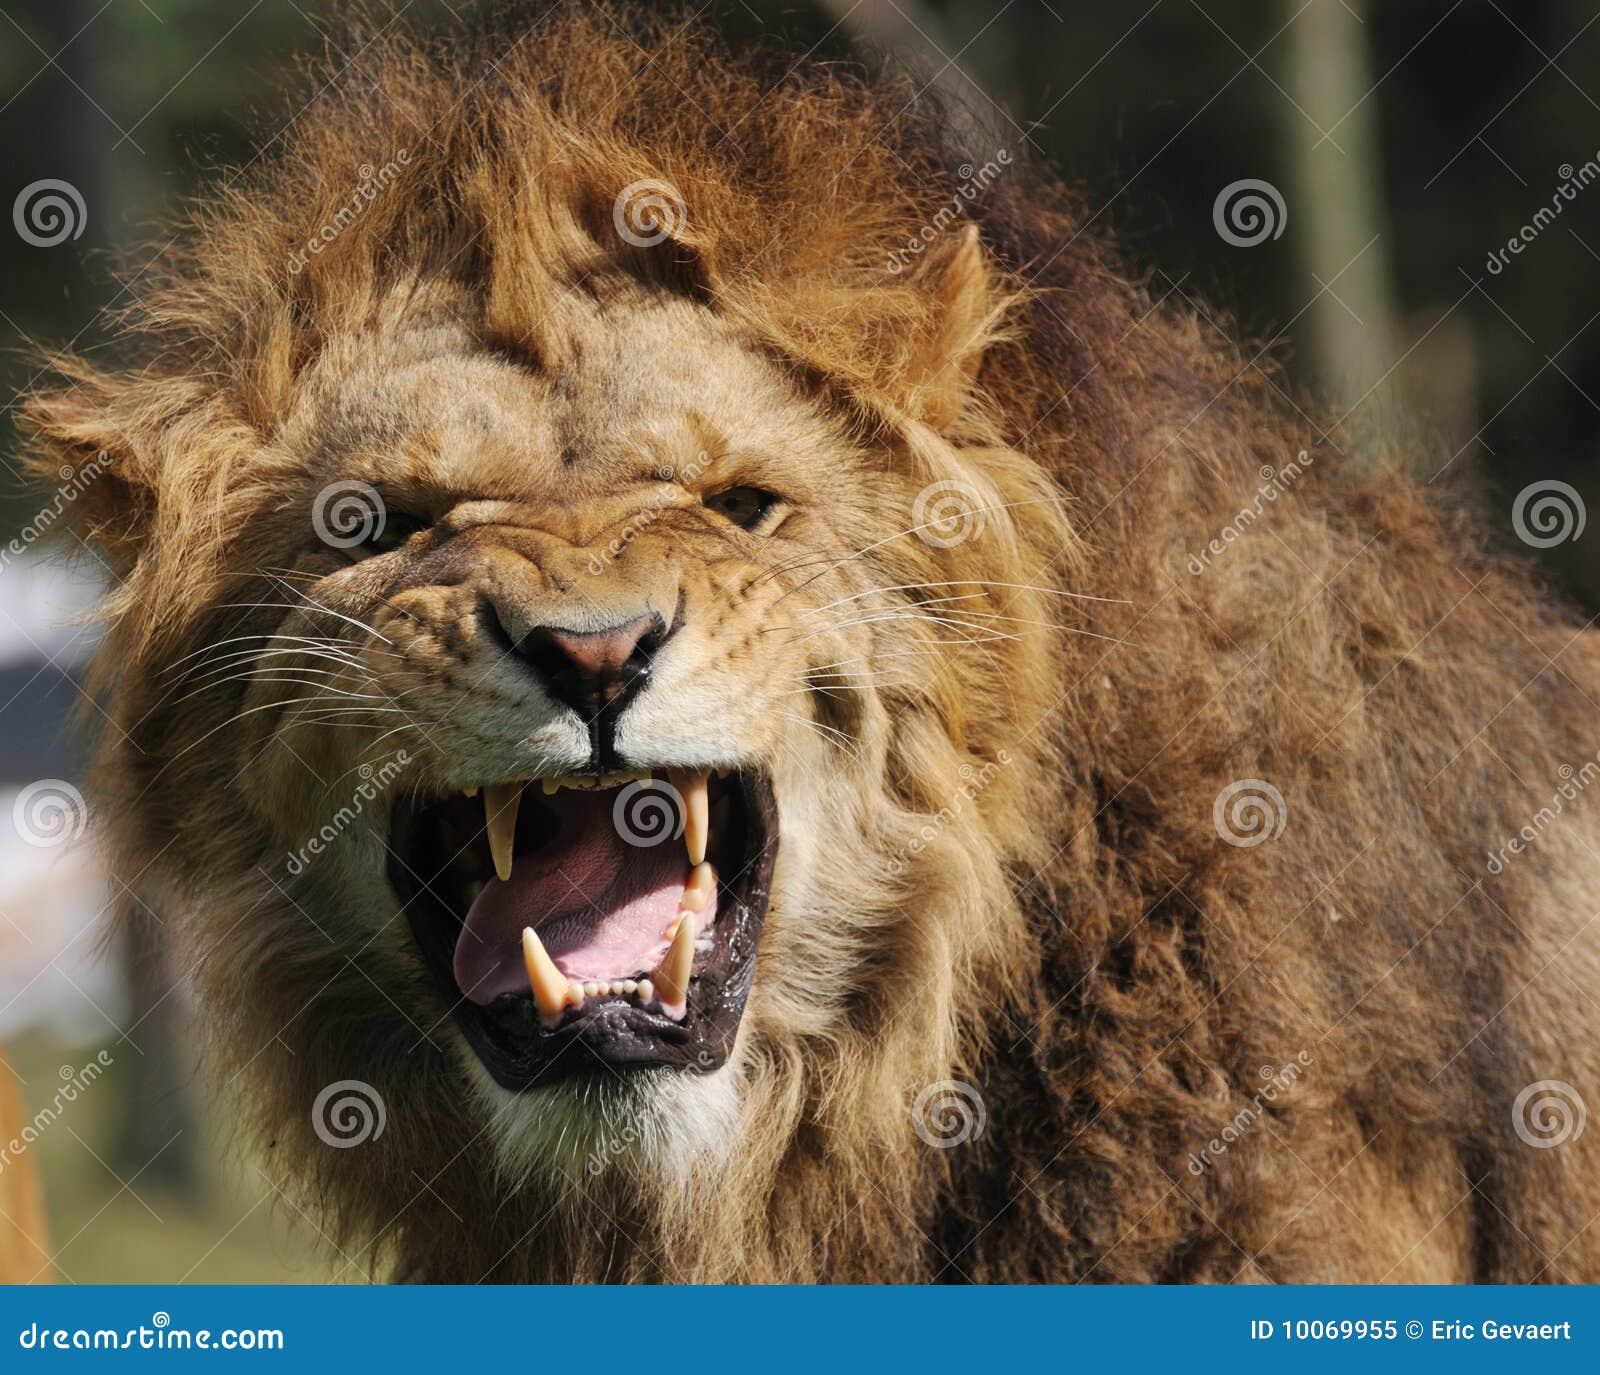 Danger Lion Wallpaper Download